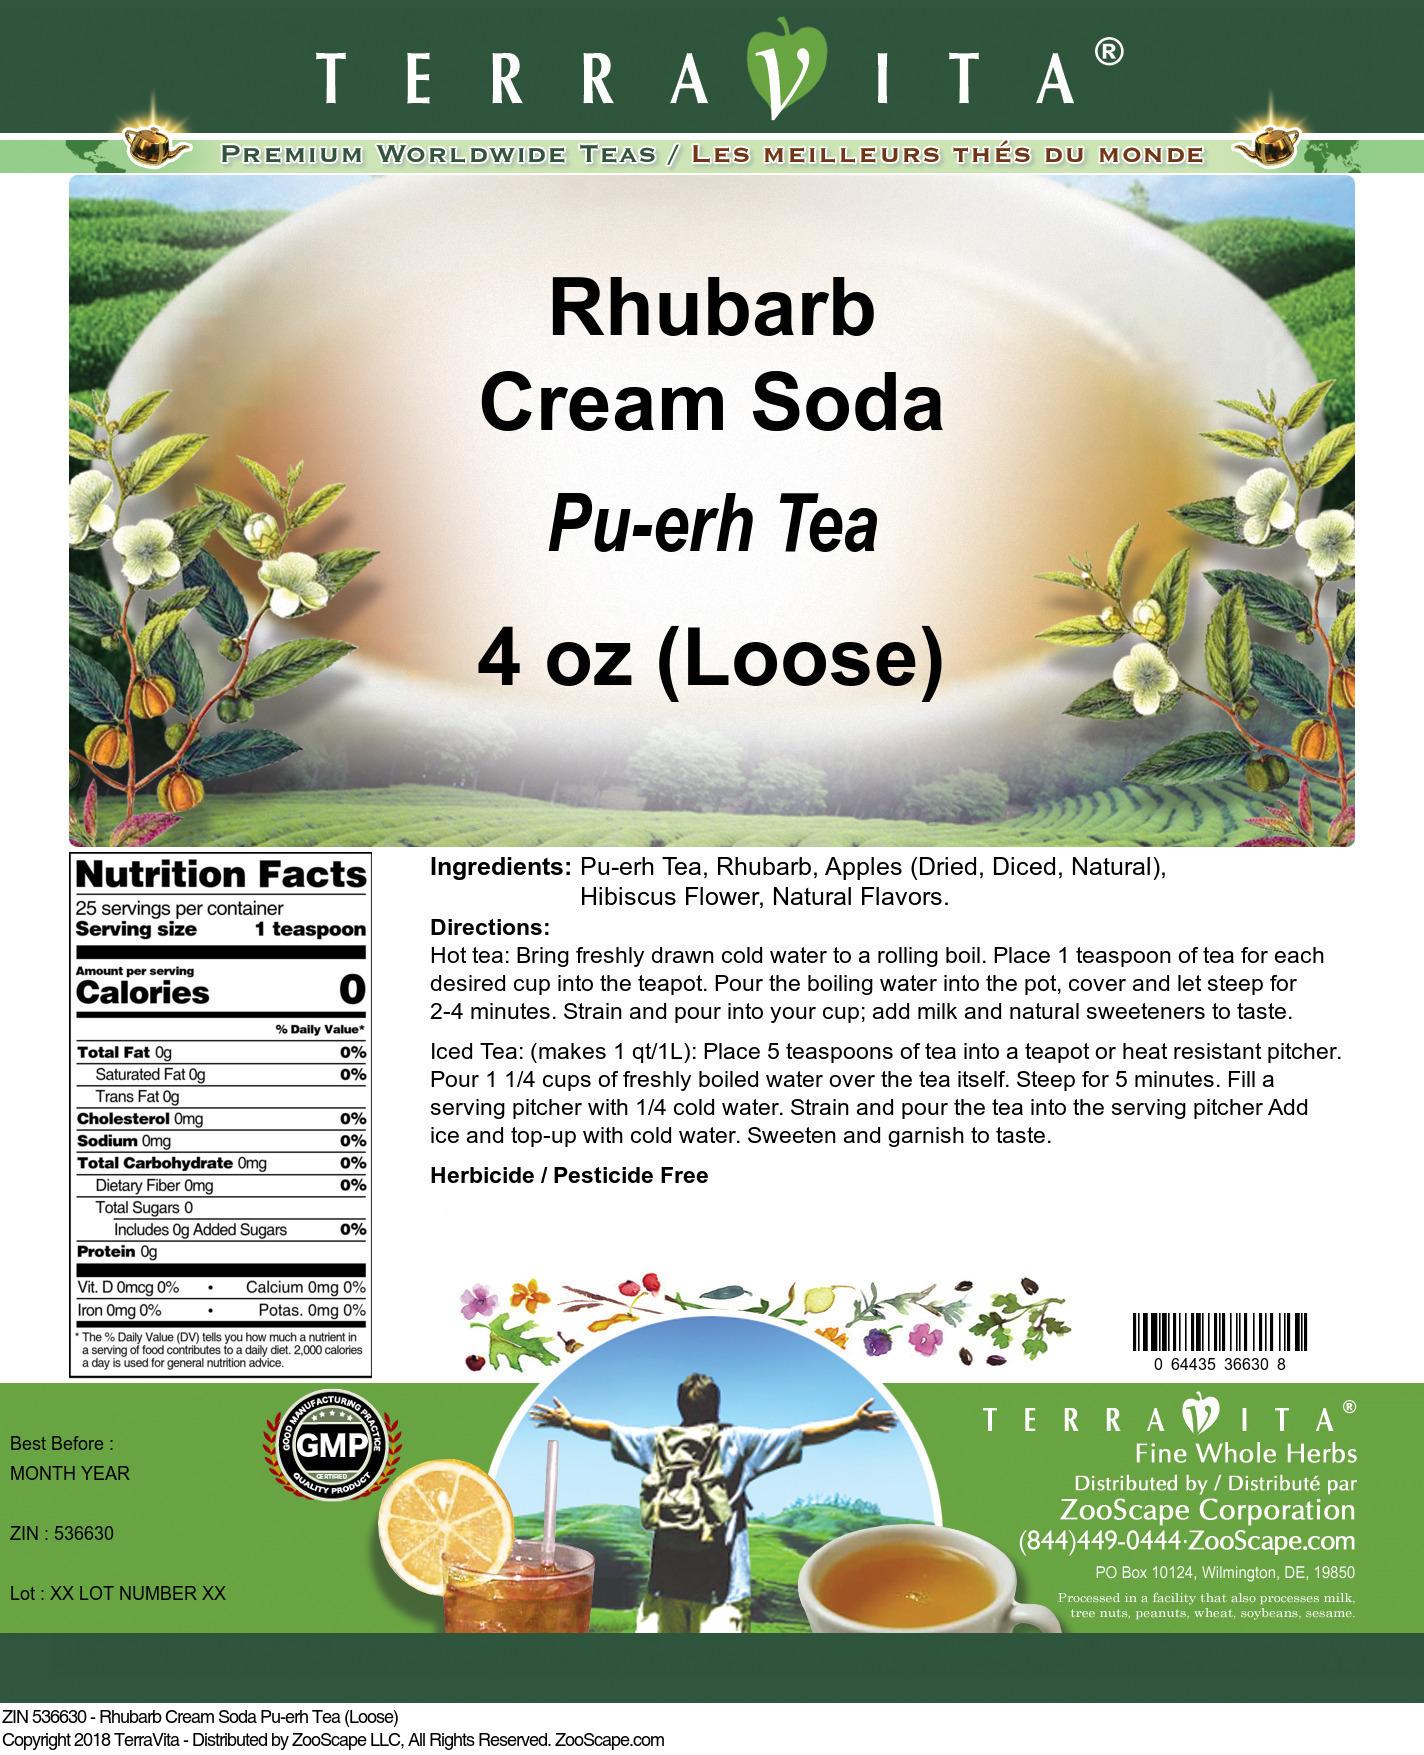 Rhubarb Cream Soda Pu-erh Tea (Loose)